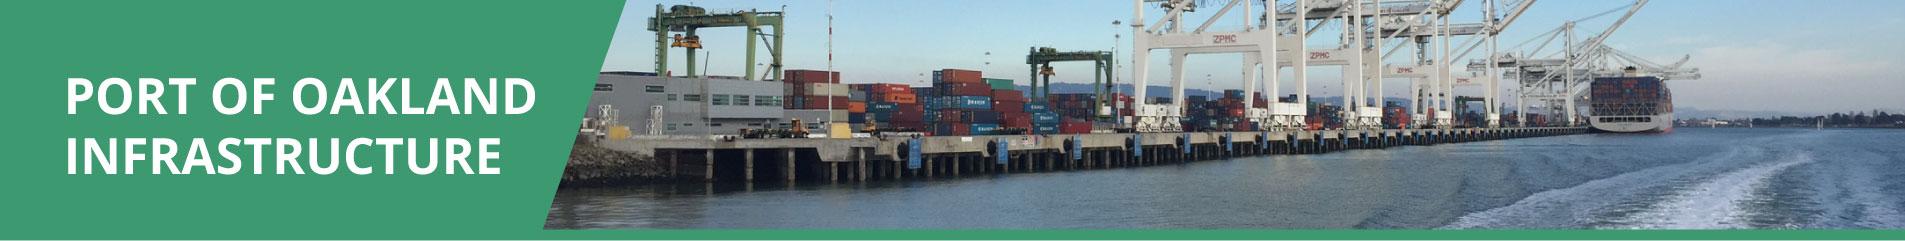 Port of Oakland Infrastructure